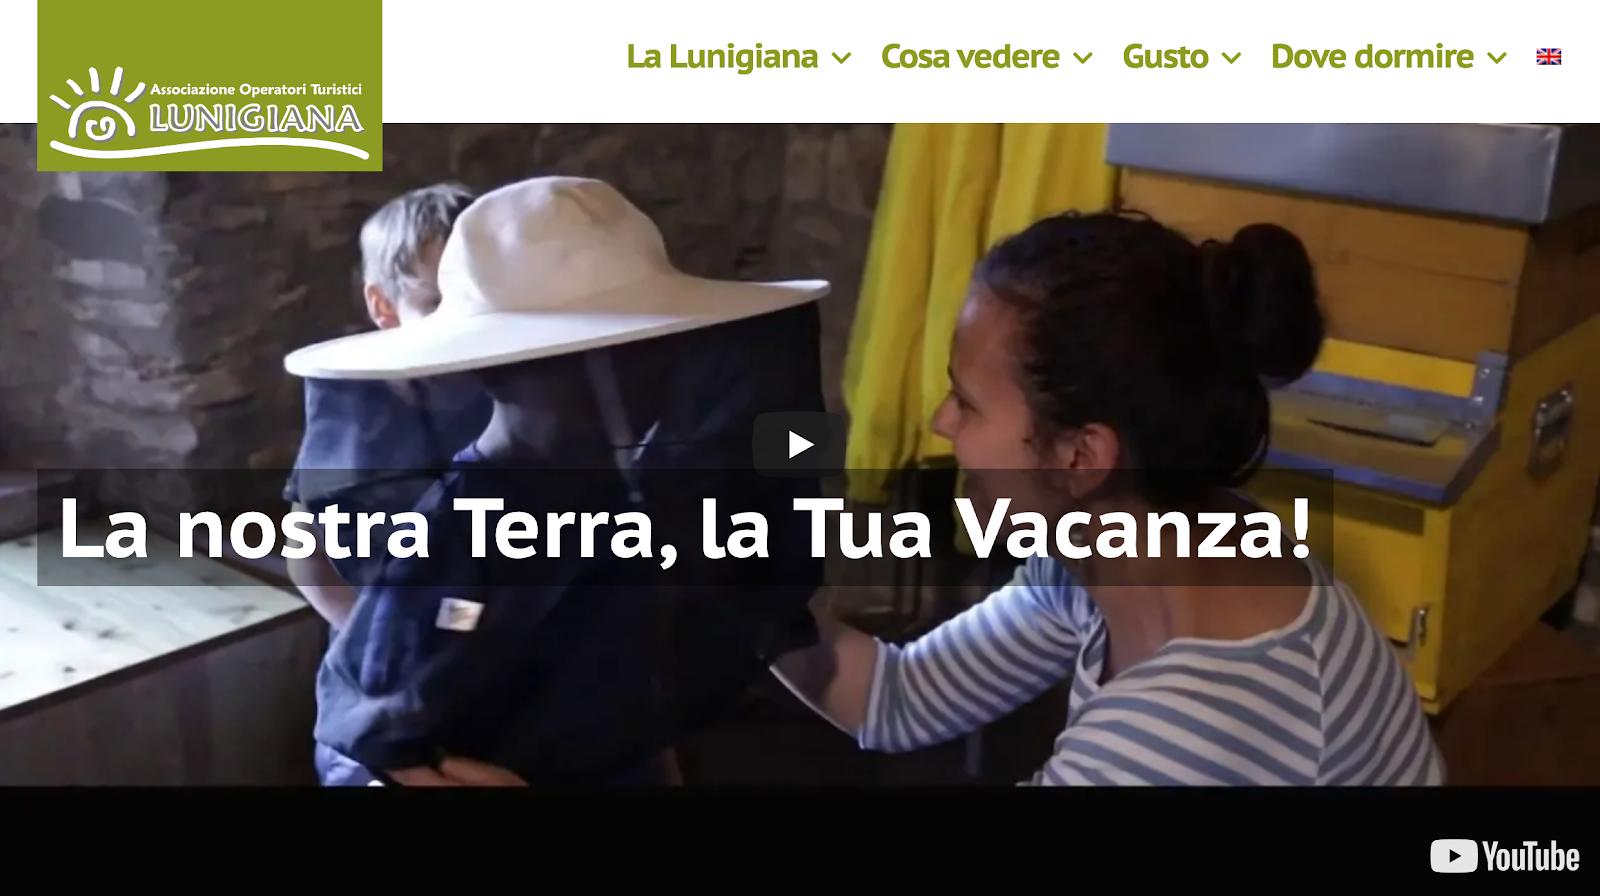 Lunigiana website made with webnode